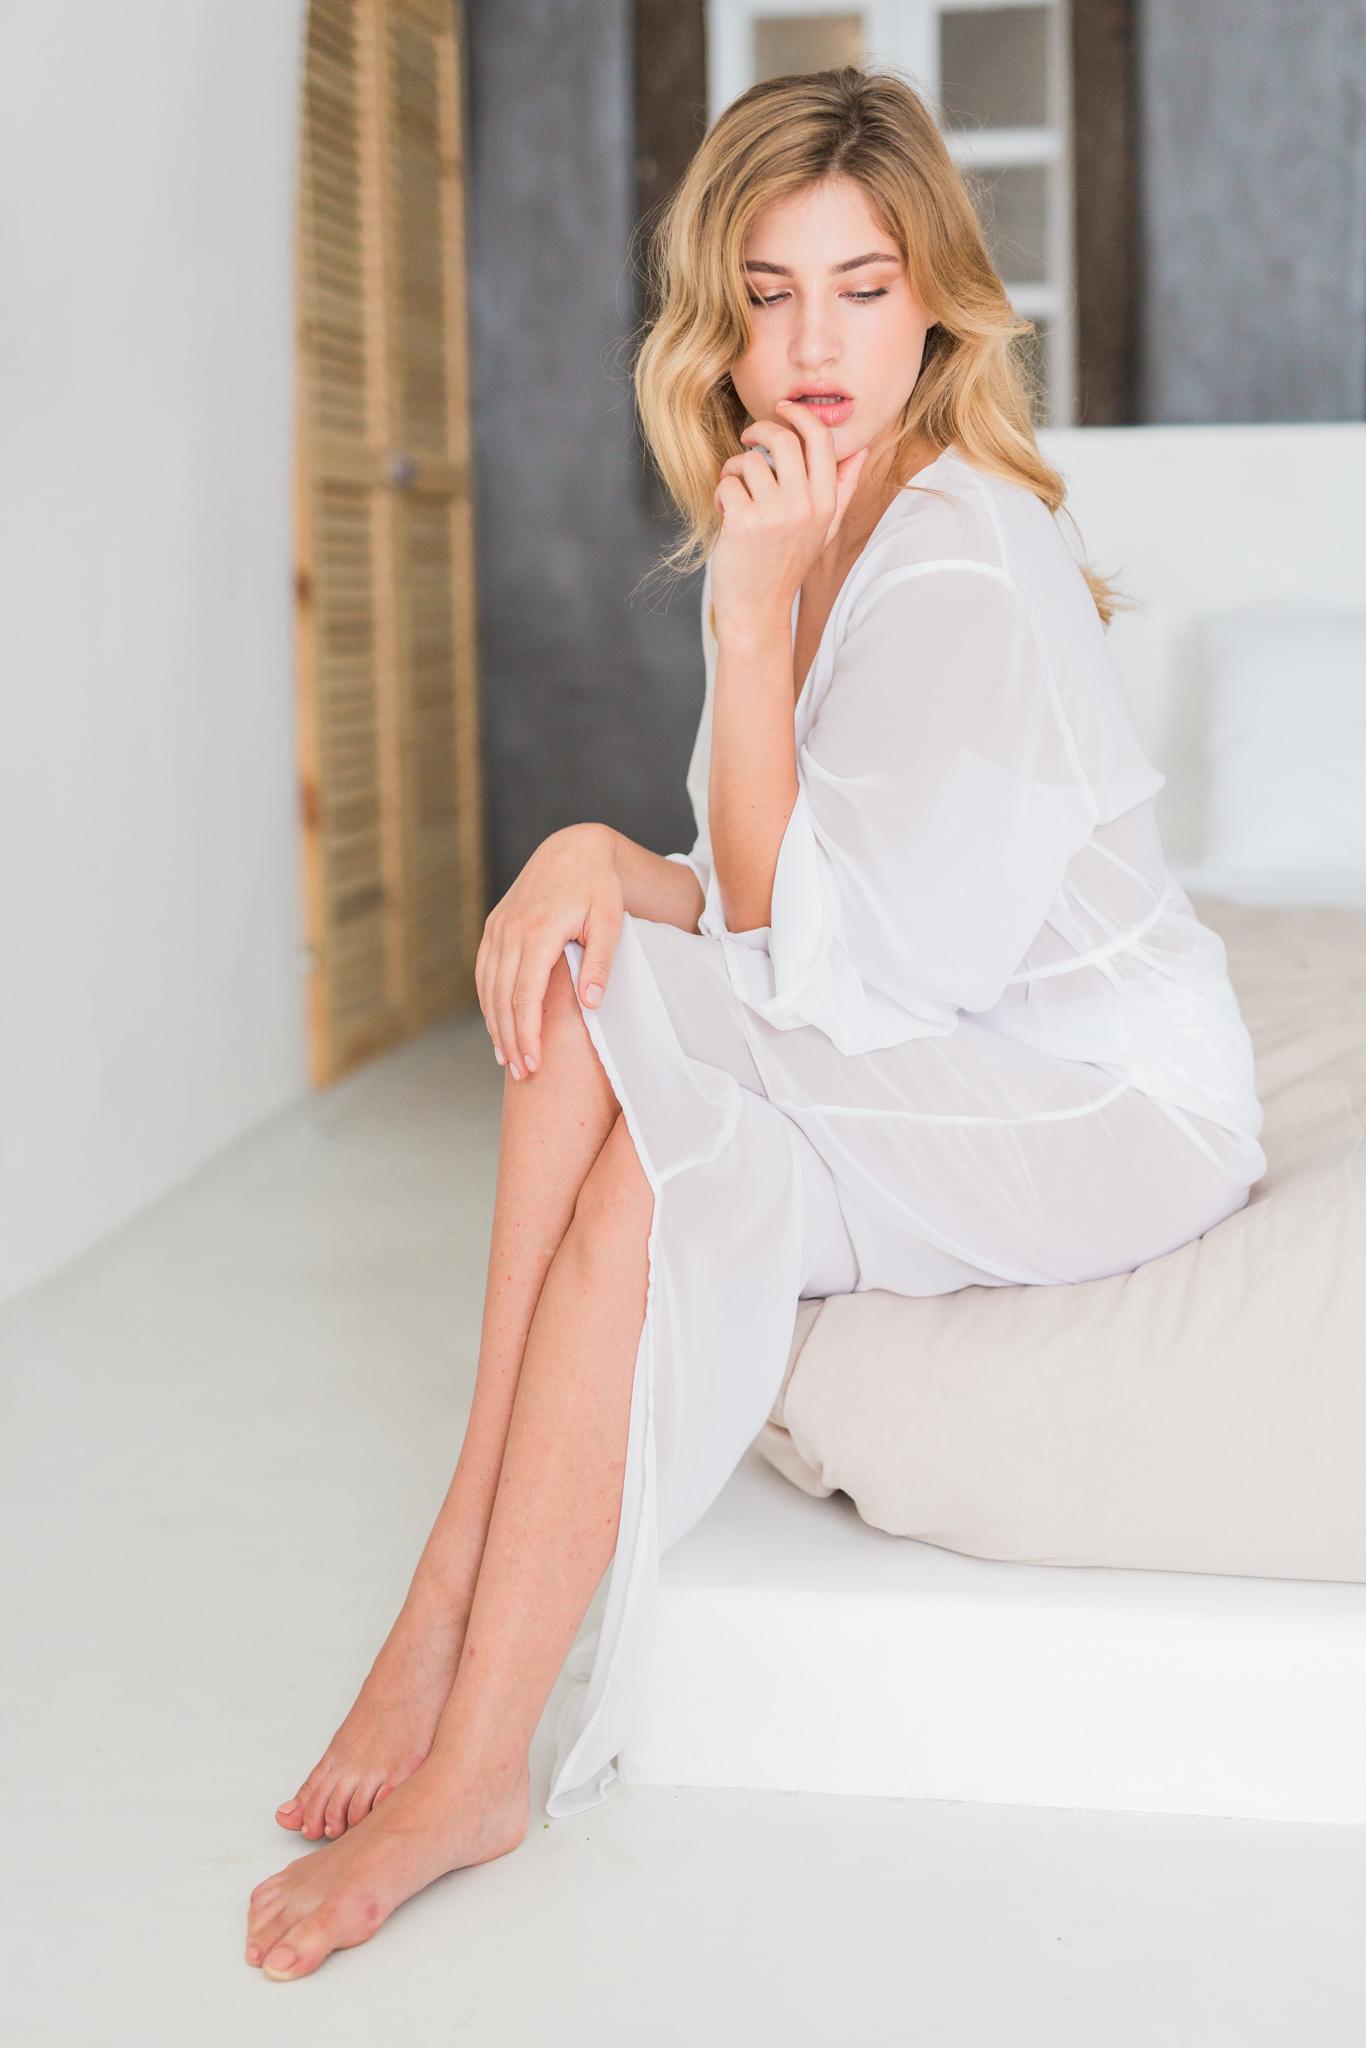 Suzanne_Li_photography_WEDDING_greece_lingerie-1.jpg